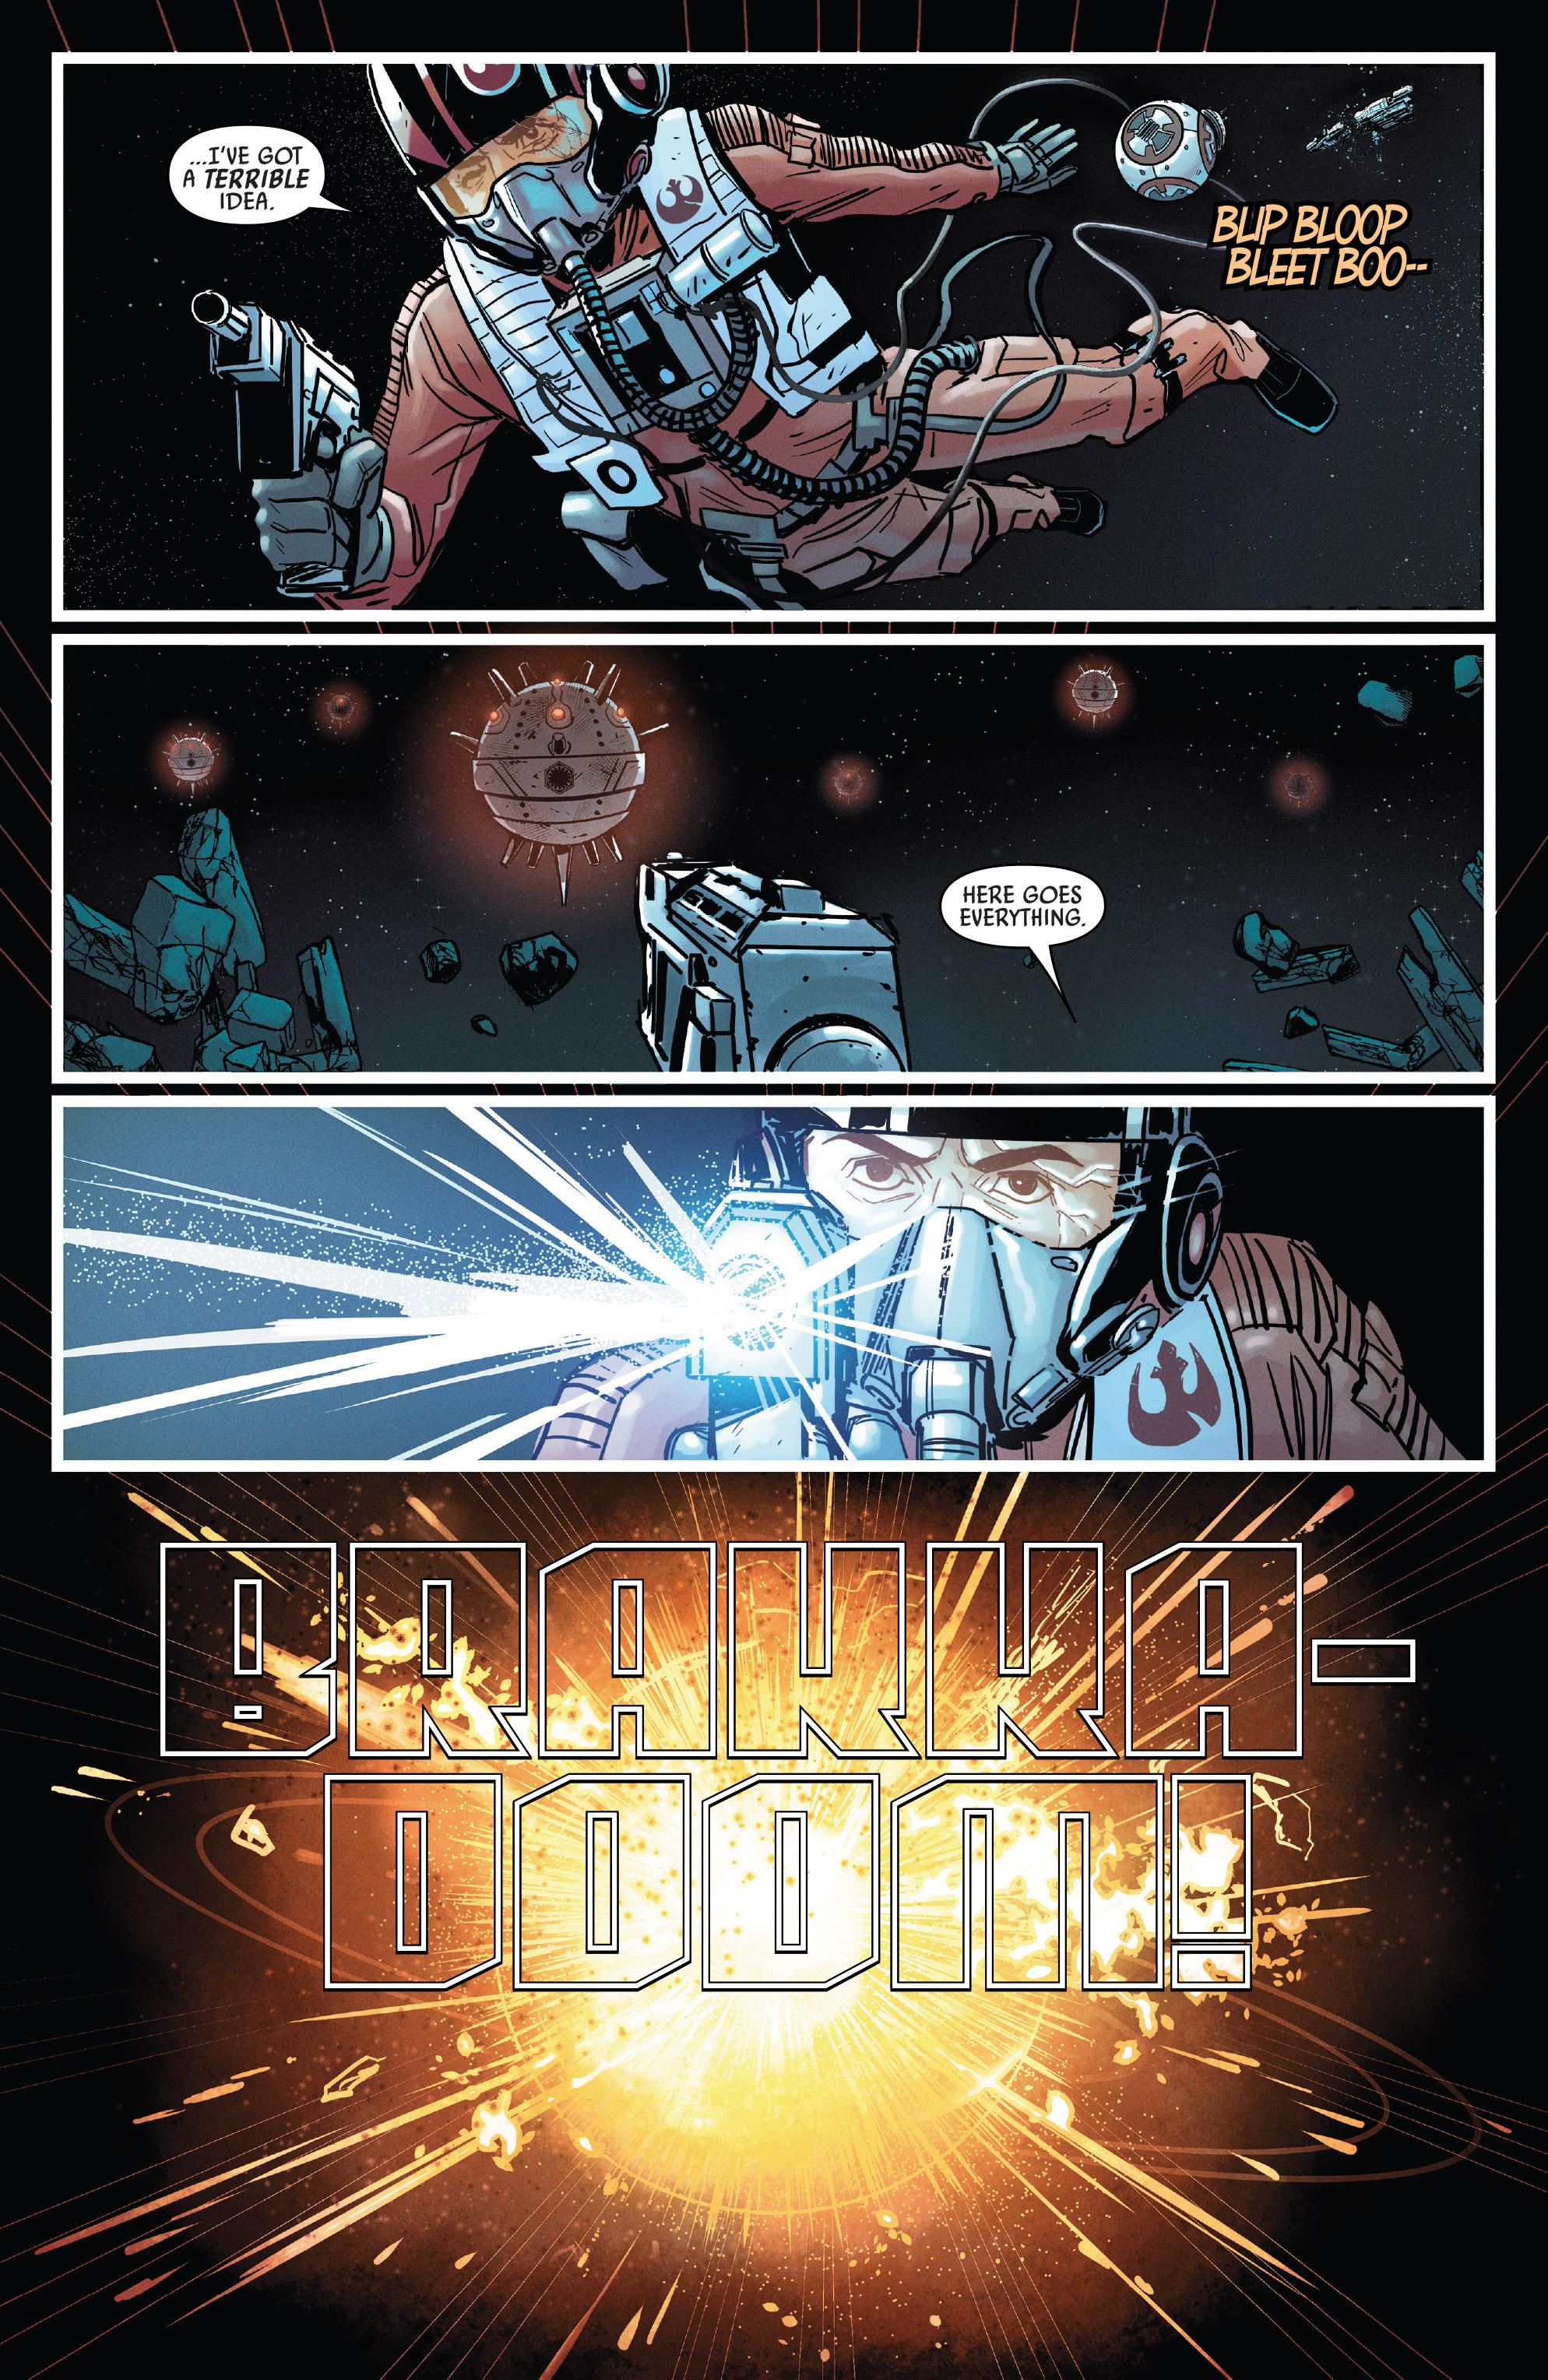 Read online Star Wars: Poe Dameron comic -  Issue # _Annual 1 - 10